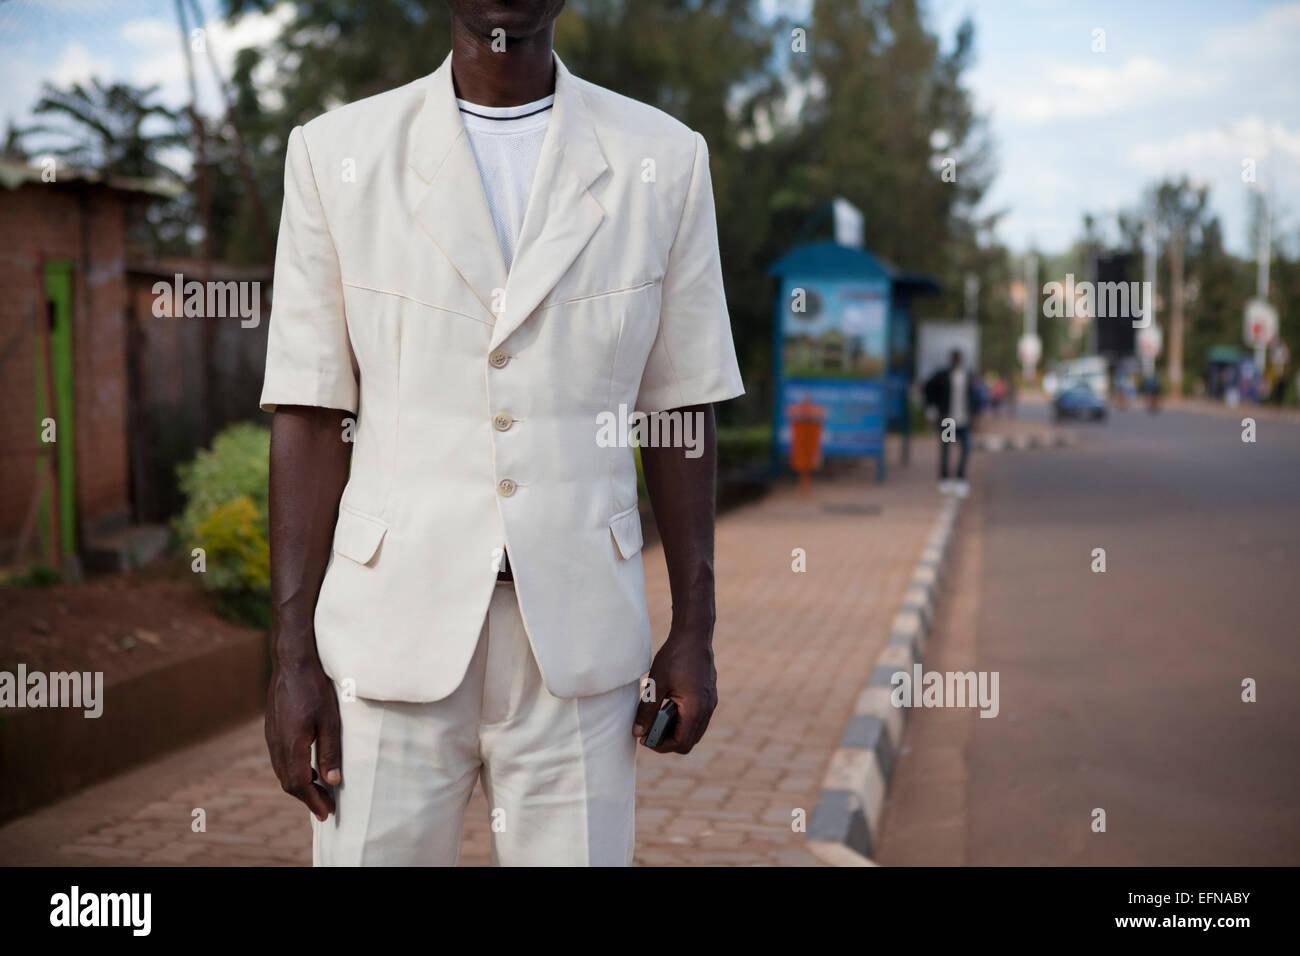 Manches courtes Homme portant costume, Kigali, Rwanda Photo Stock